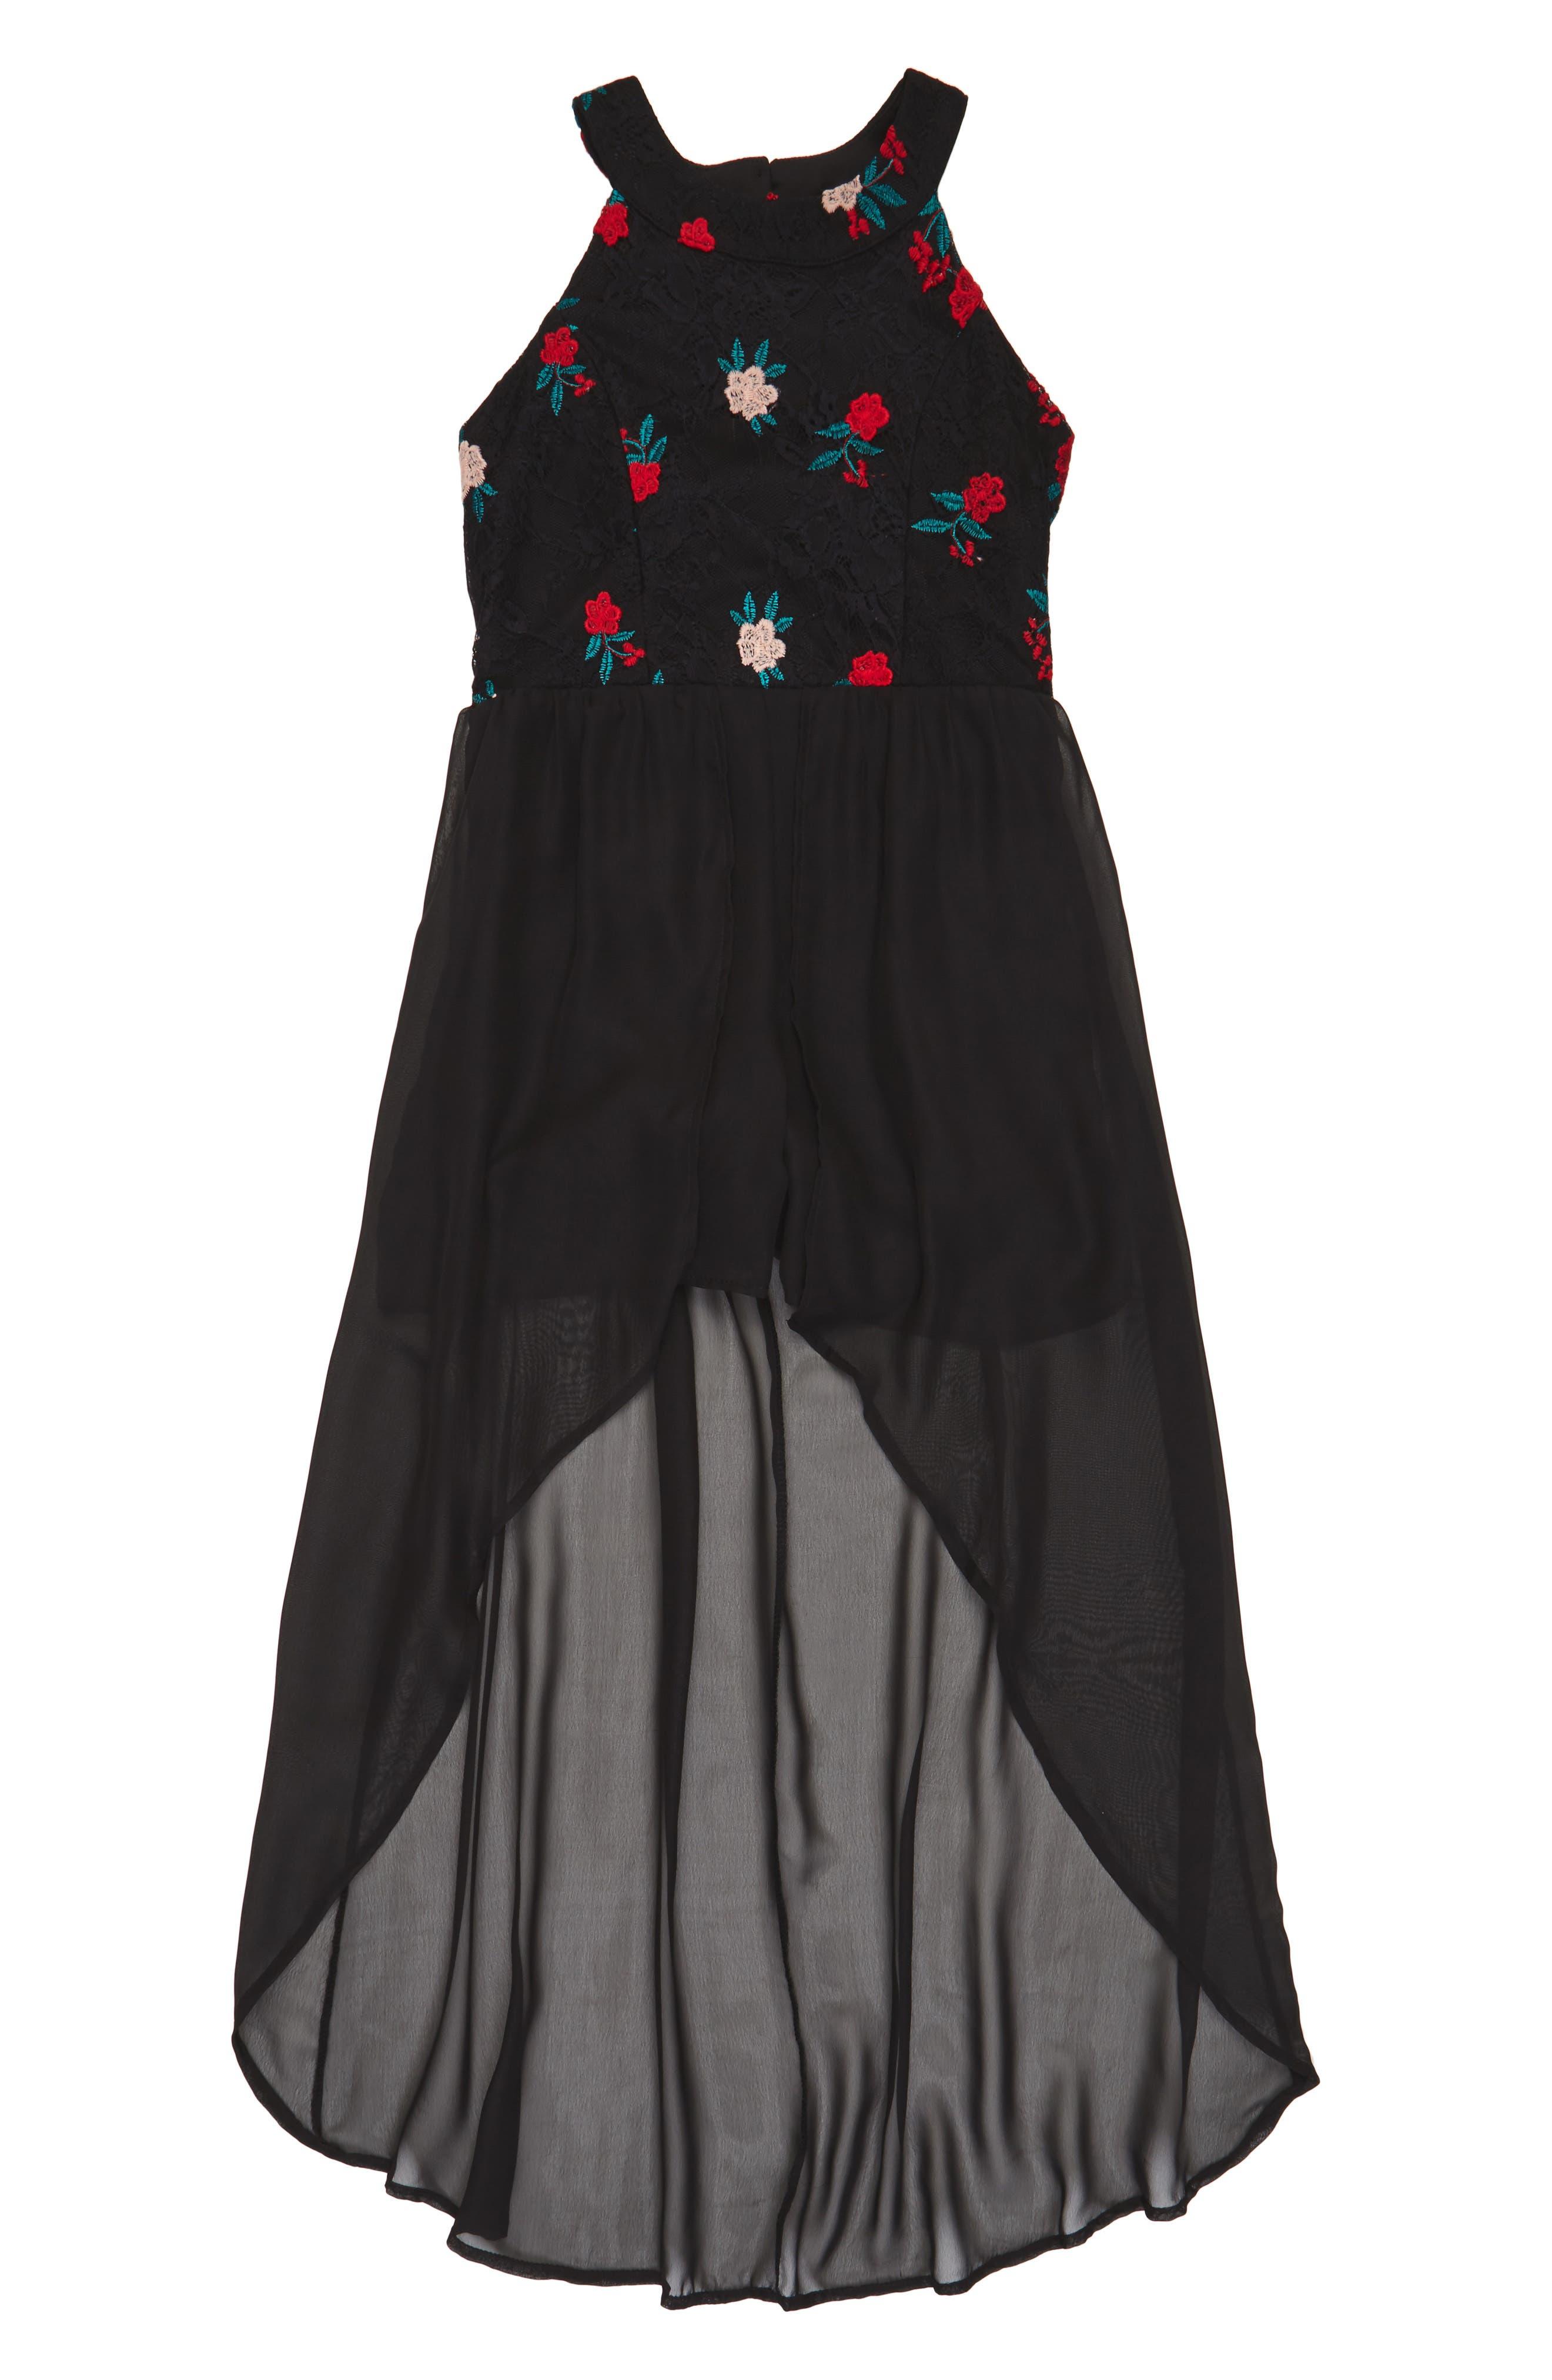 Embroidered Lace Overlay Romper,                         Main,                         color, Black/ Multi